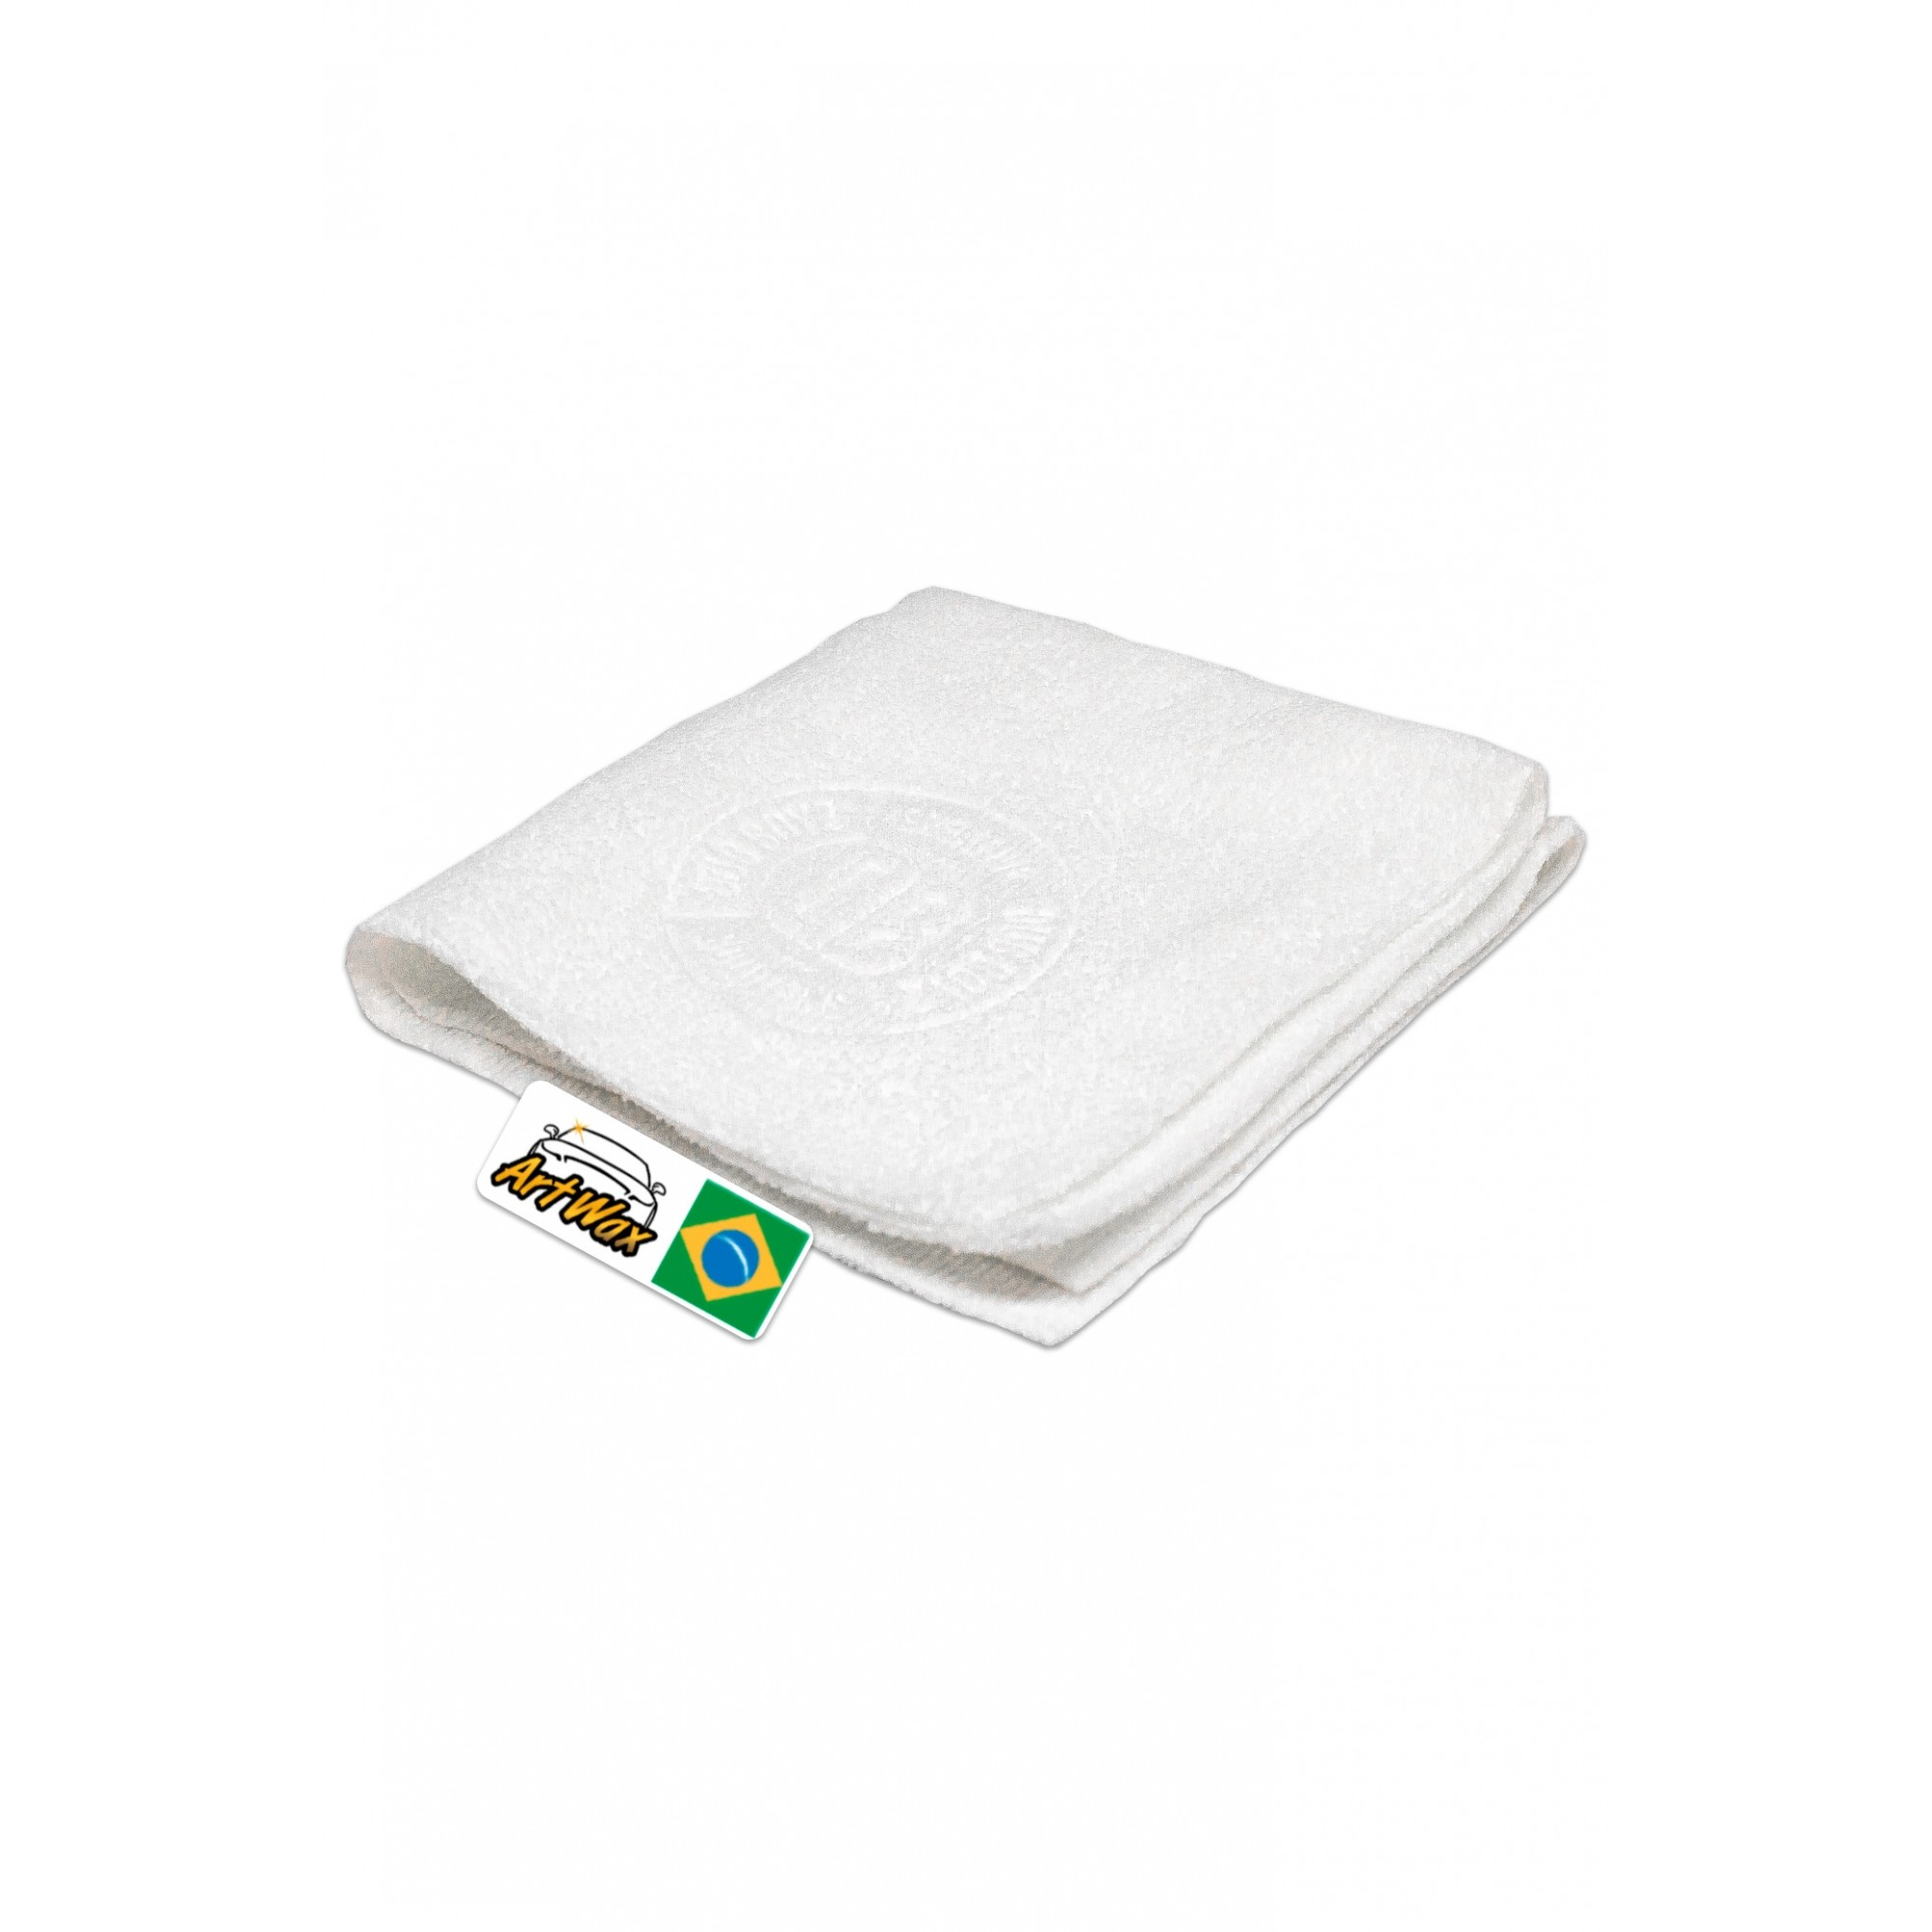 Microfibra Vitrificação Branca DB Coating Towel 30x30cm - 300gsm Dub Boyz